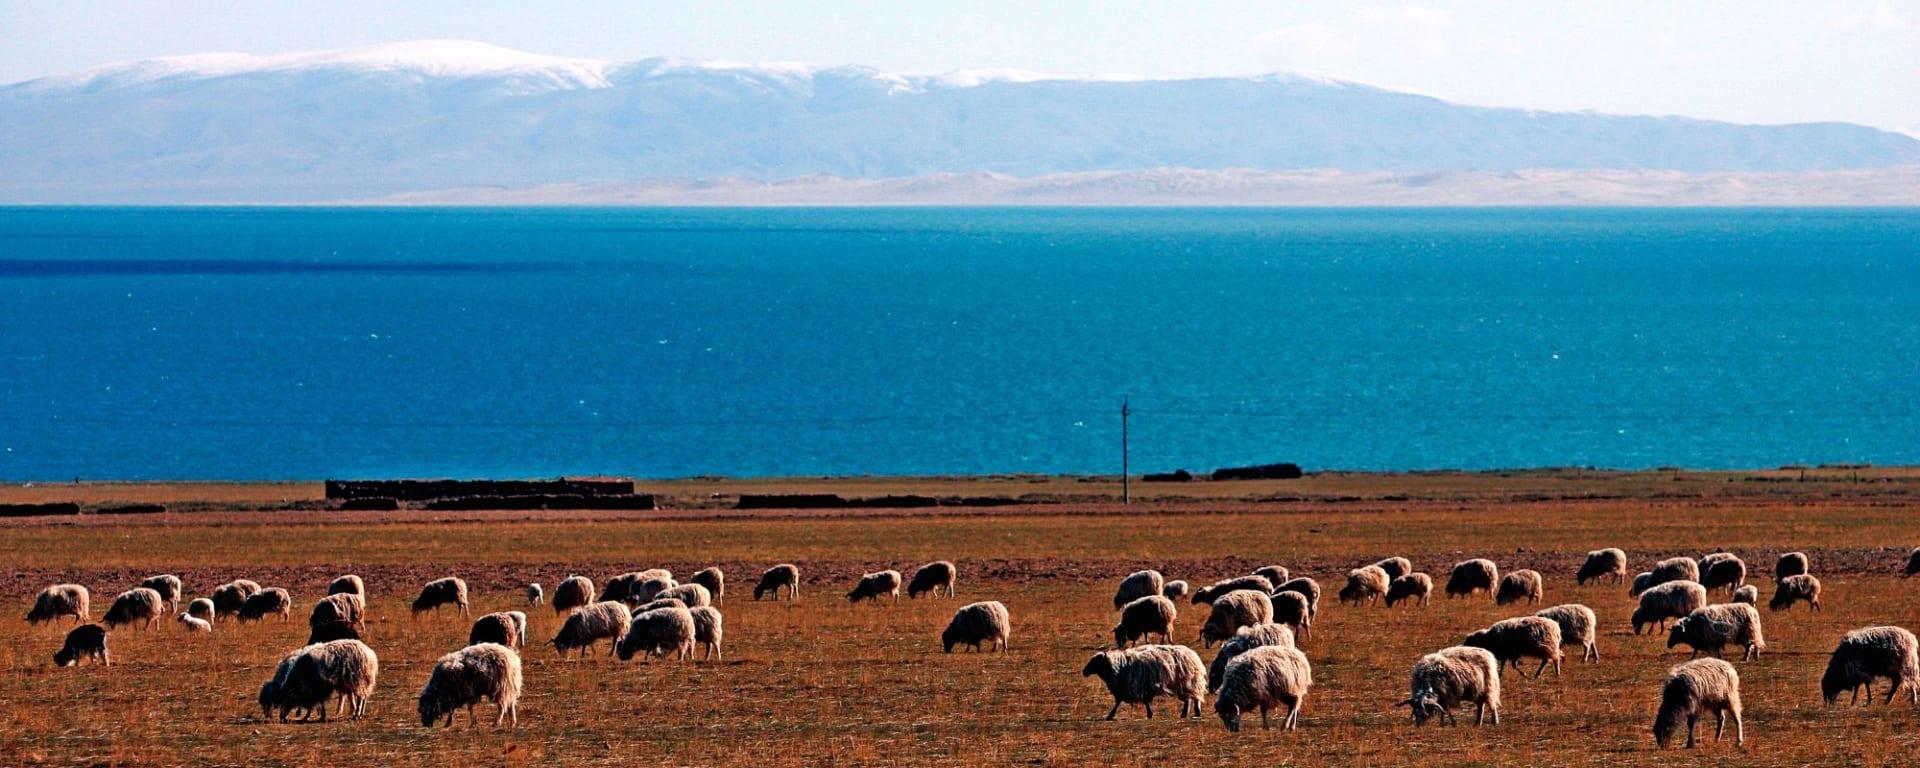 Die Magie des Tibets - Basis & Tsetang Verlängerung ab Lhasa: Tibetetan landscape with lake, mountains and sheeps